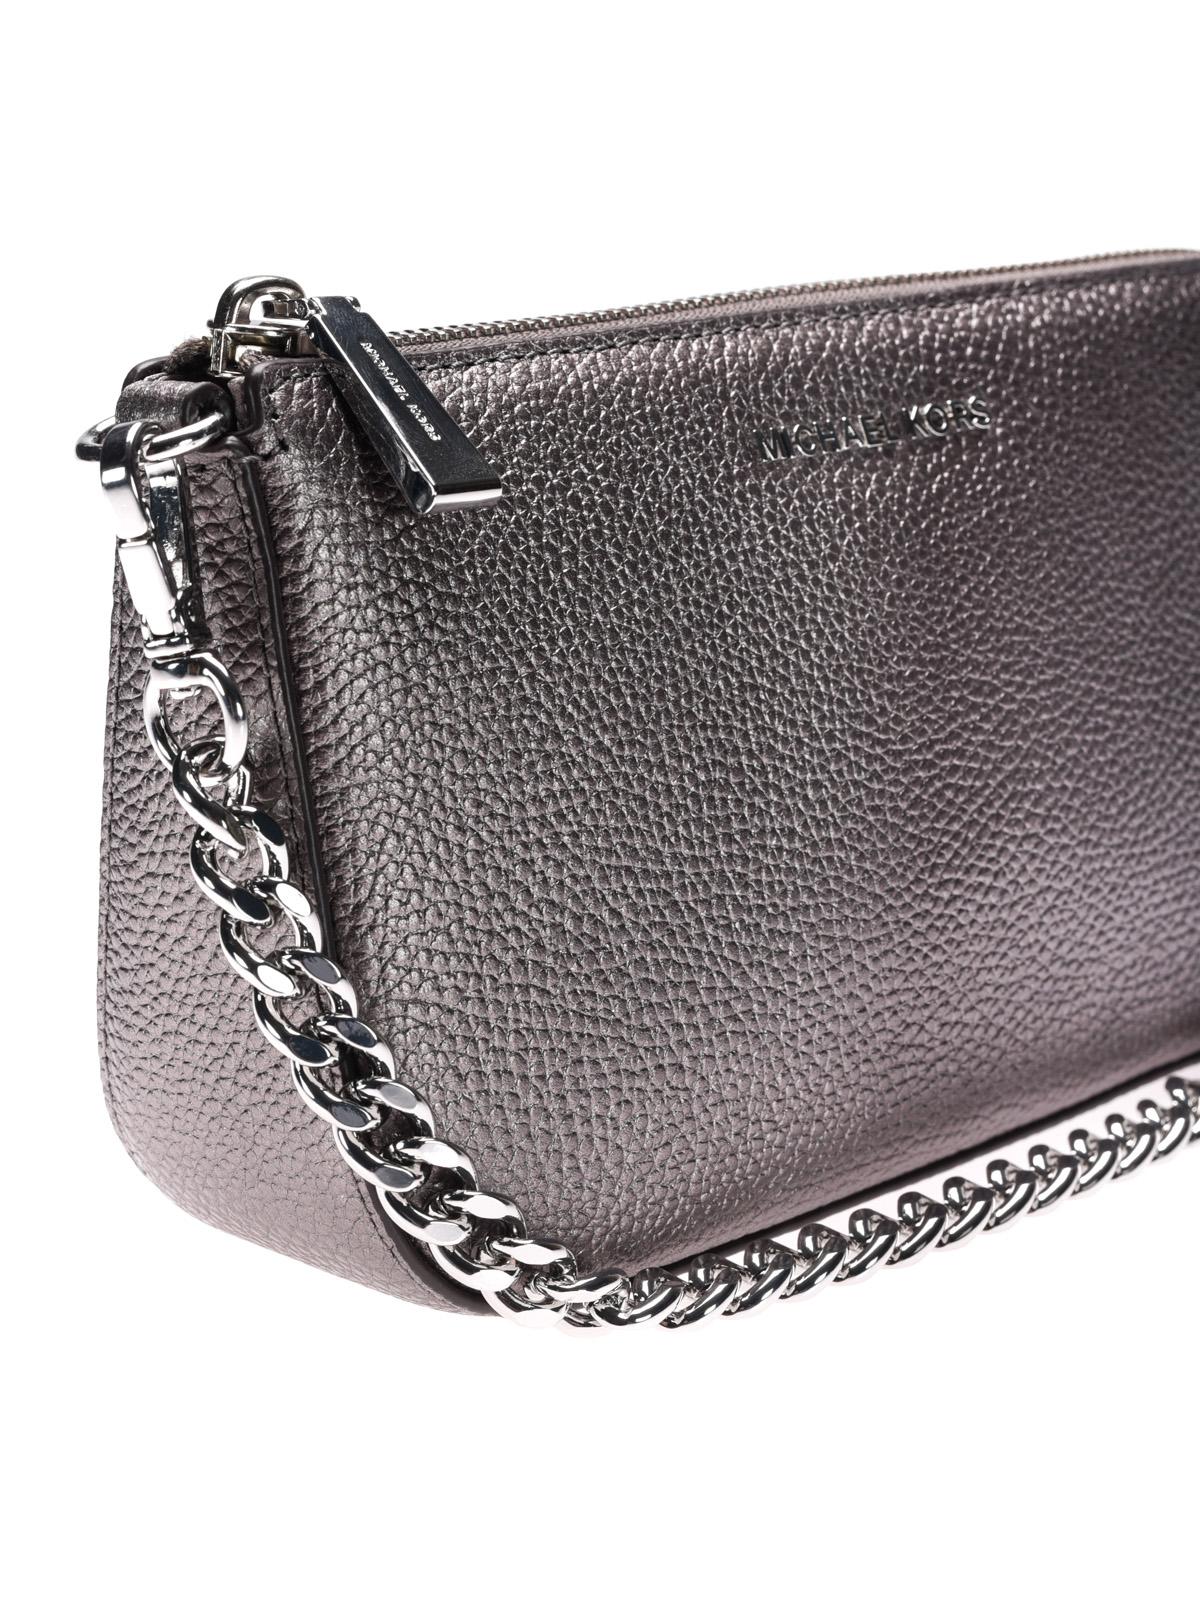 9849c6459191ed ... Jet Set gunmetal wristlet purse shop online Michael Kors ...